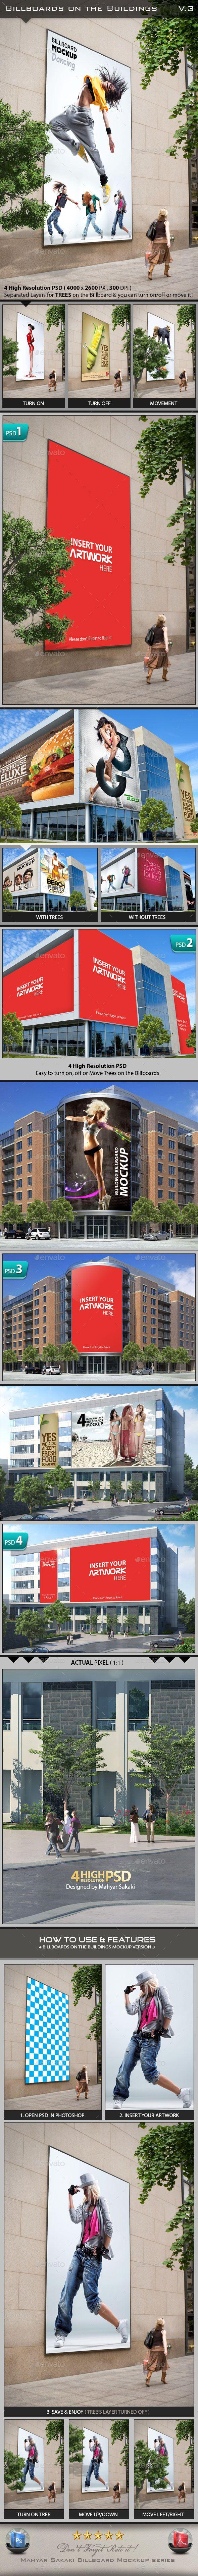 Billboards On The Buildings Mockup #design Download: http://graphicriver.net/item/billboards-on-the-buildings-mockup/11803144?ref=ksioks